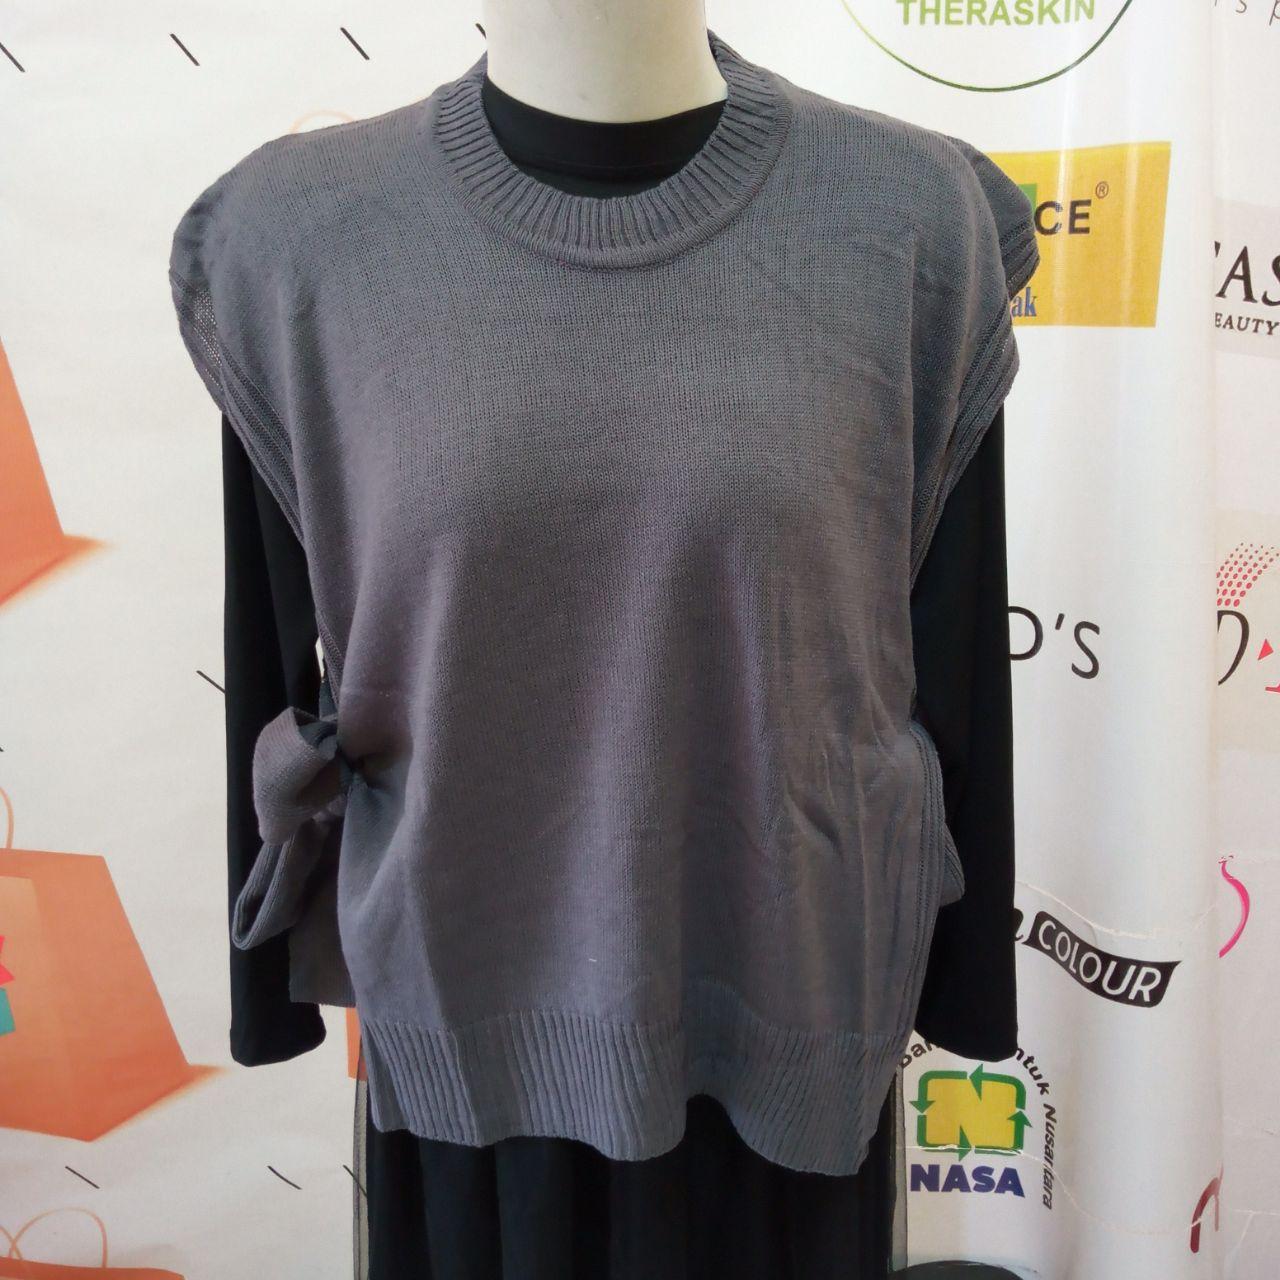 ini adalah Rajut Vest Andin Abu Tua, size: L, material: knitt, color: Grey, brand: vestknittindonesia, age_group: all ages, gender: female